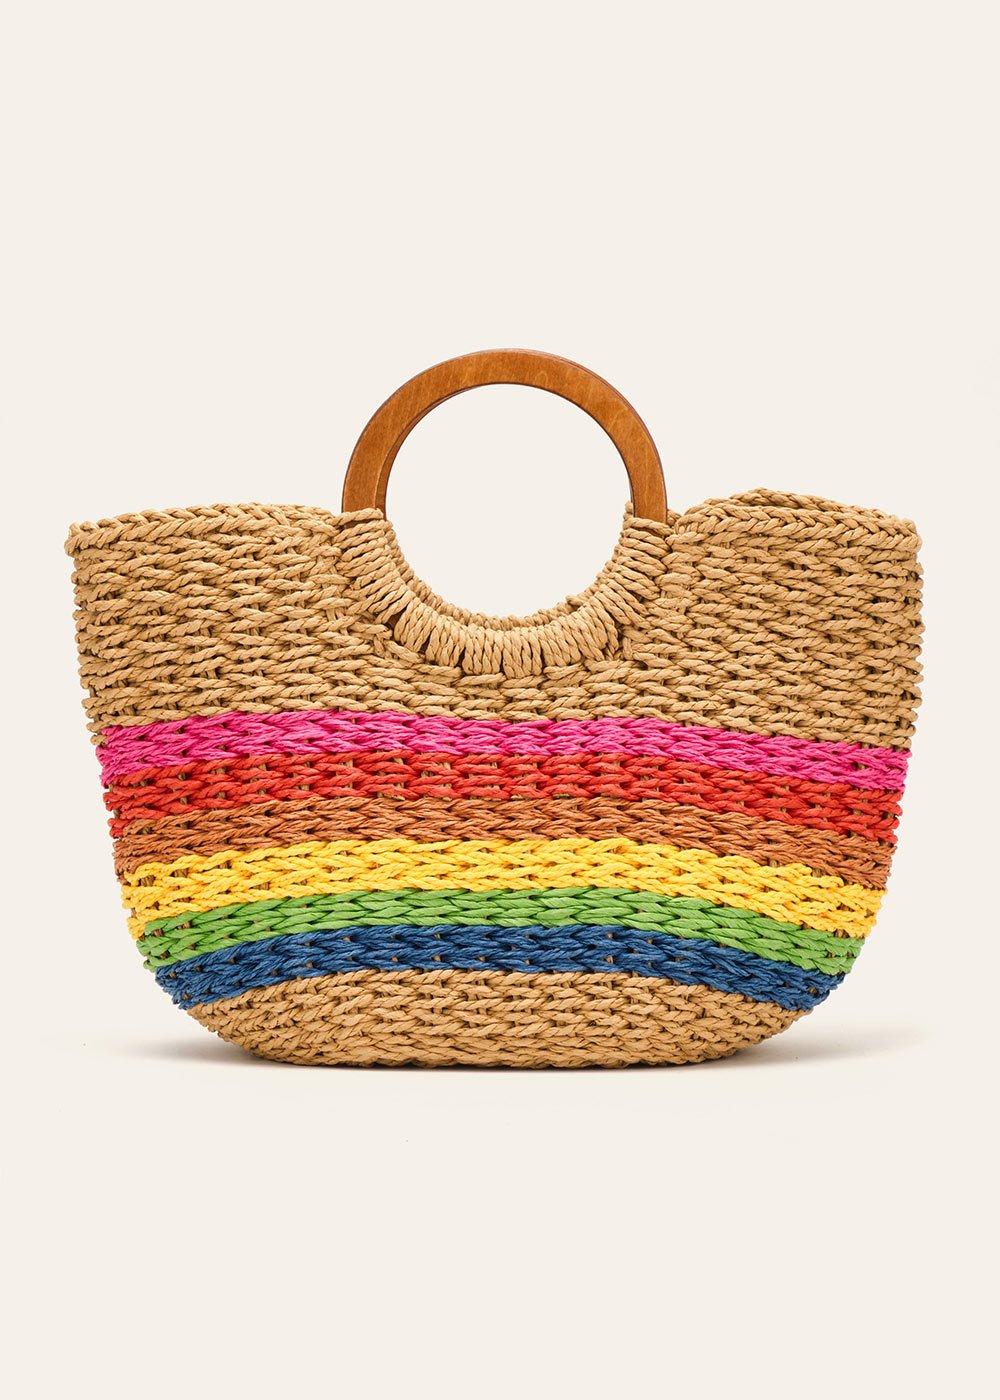 Bindy shopping bag with wooden handles - Safari - Woman